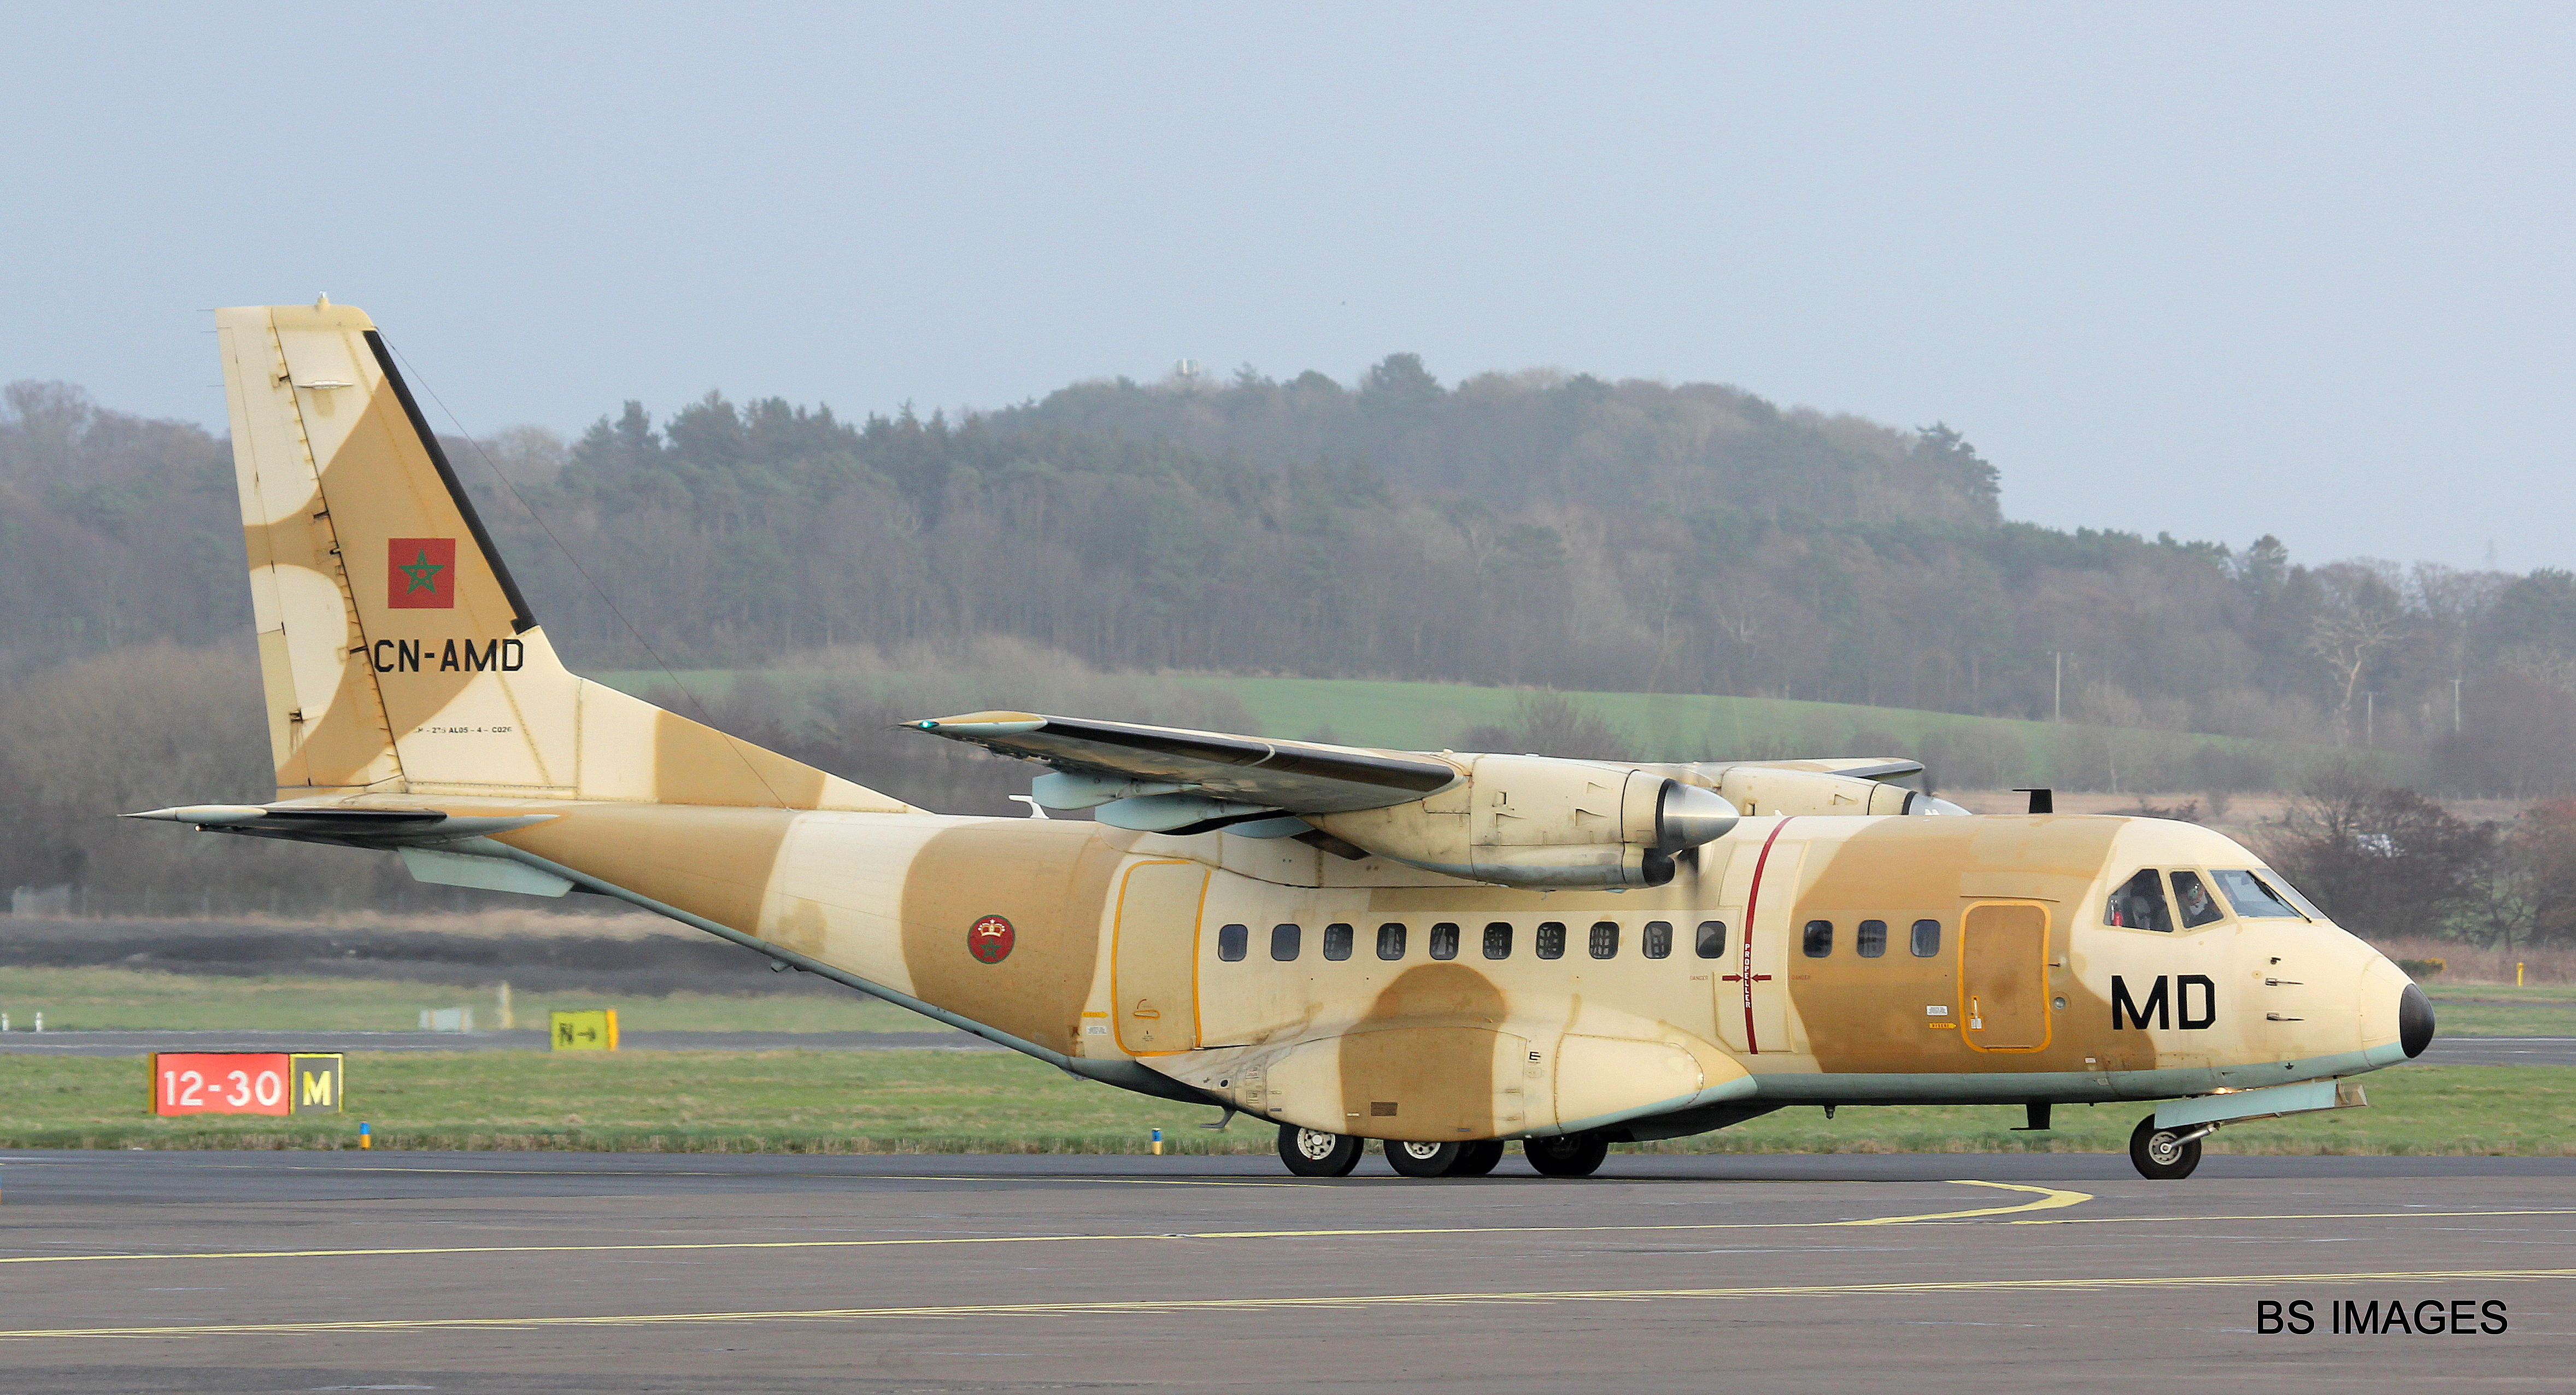 FRA: Photos d'avions de transport - Page 31 33288582386_afbab16981_o